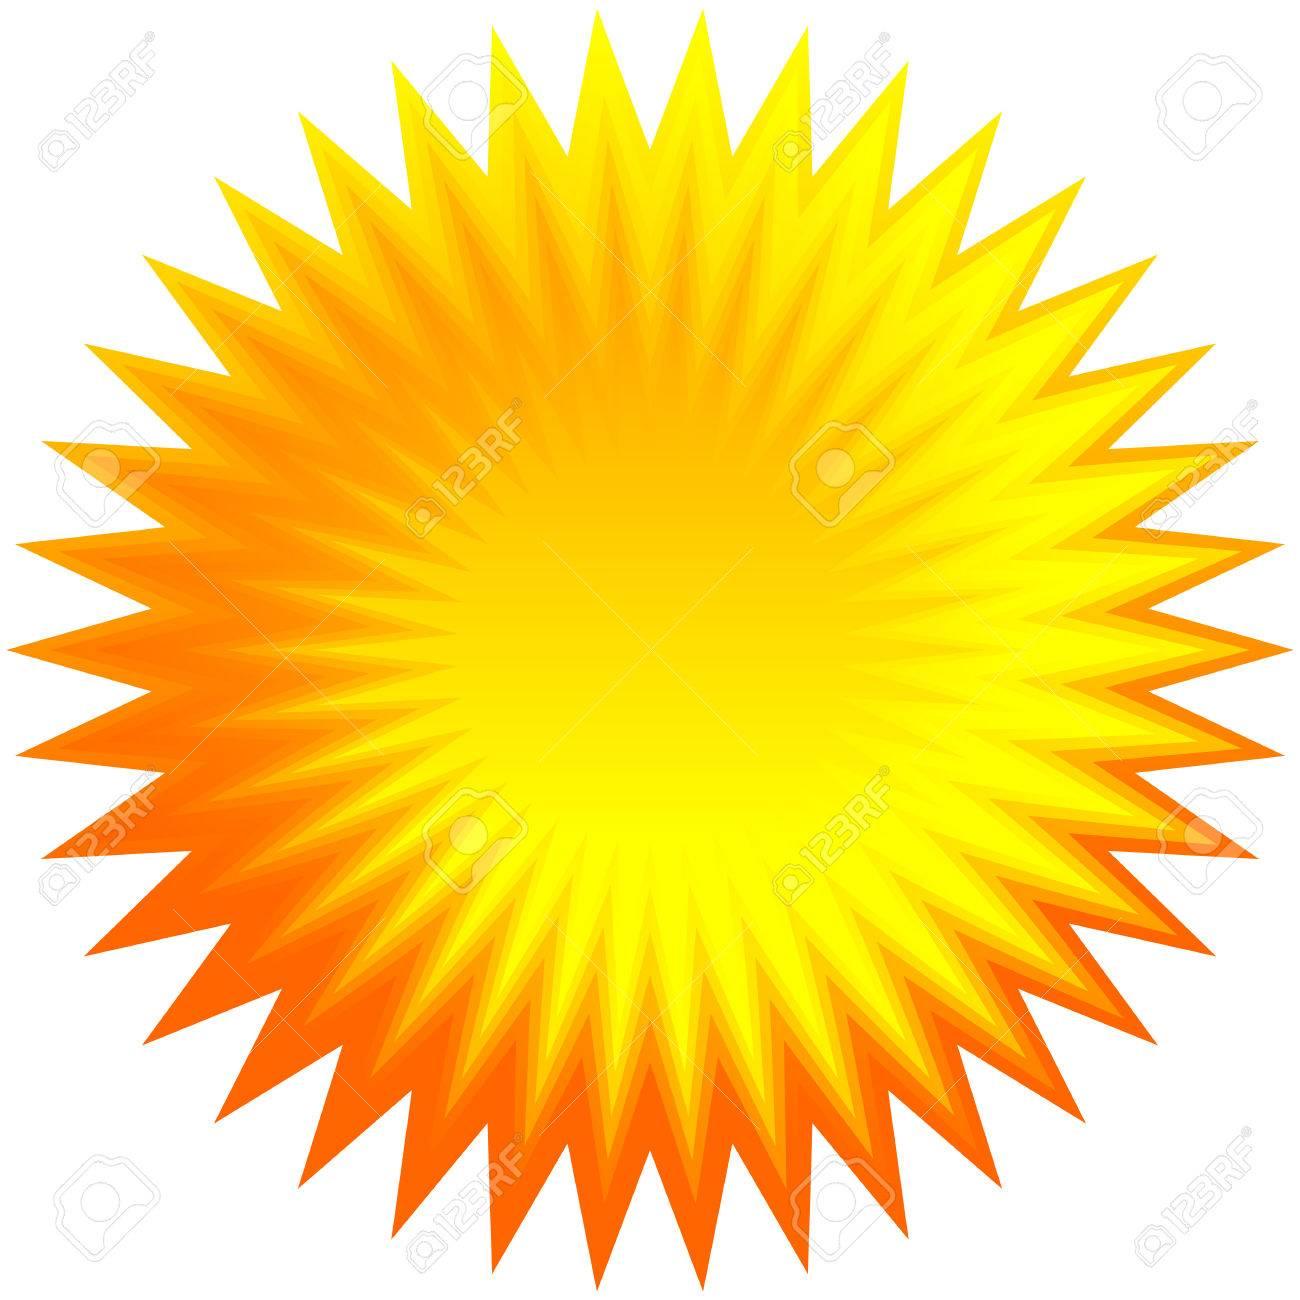 set of orange geometric sunburst starburst background royalty free rh 123rf com starburst vector free starburst vector background